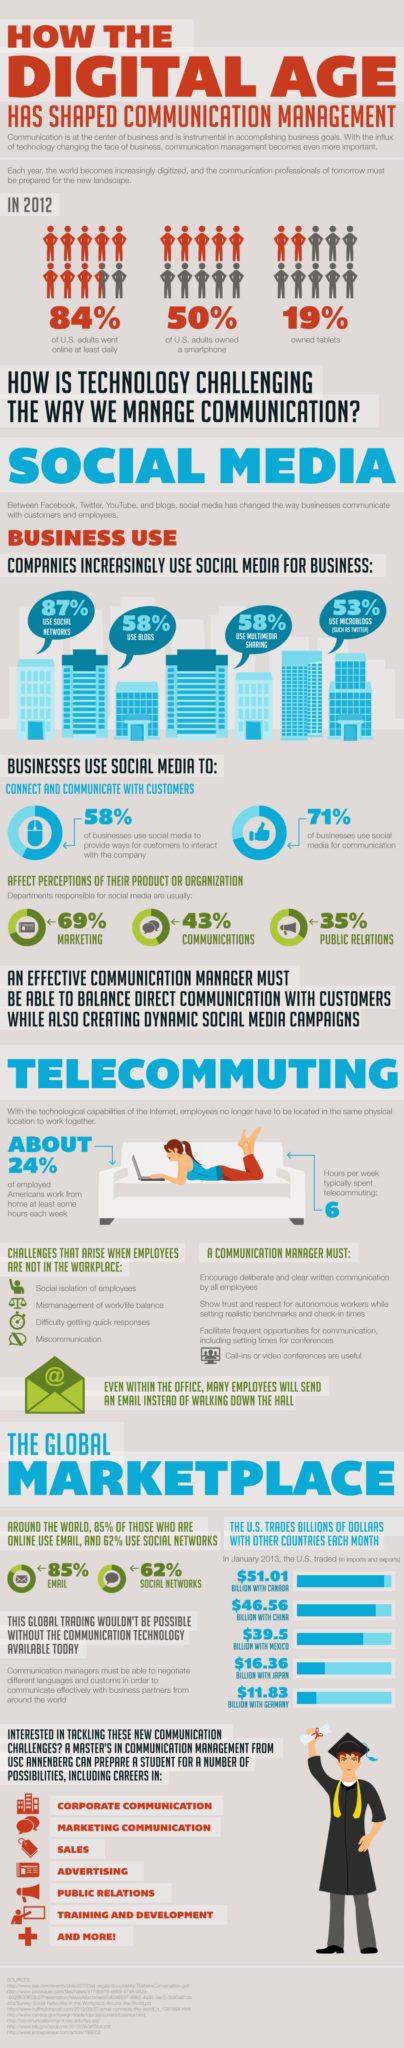 Communication Management